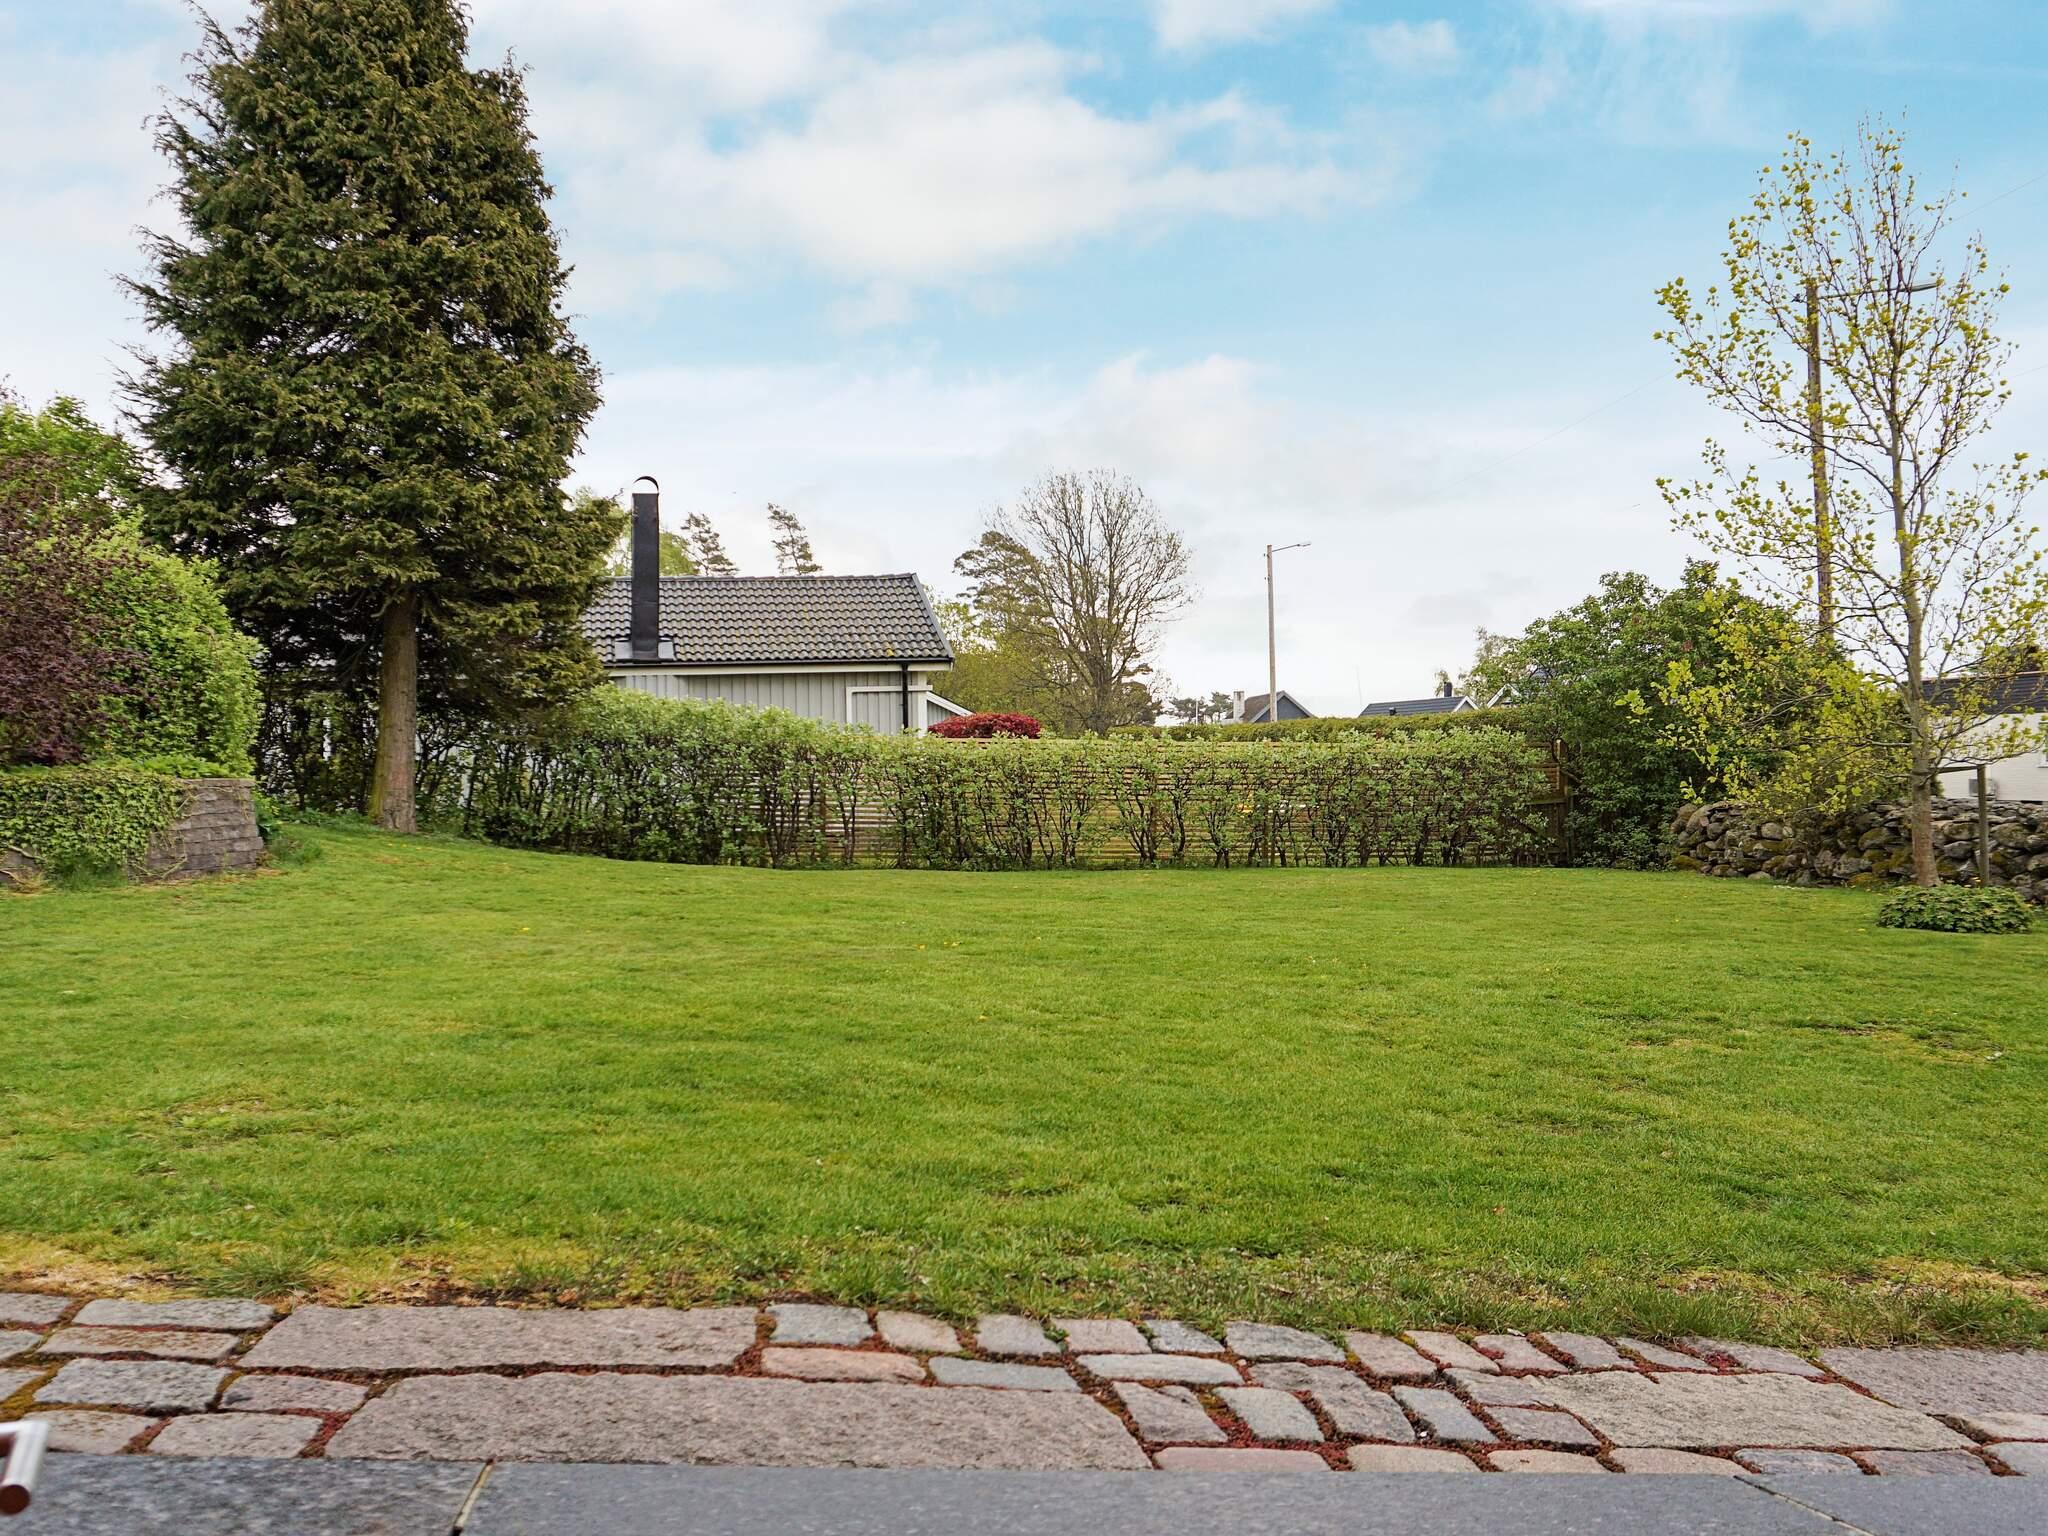 Ferienhaus Onsala (2619121), Onsala, Hallands län, Südschweden, Schweden, Bild 4